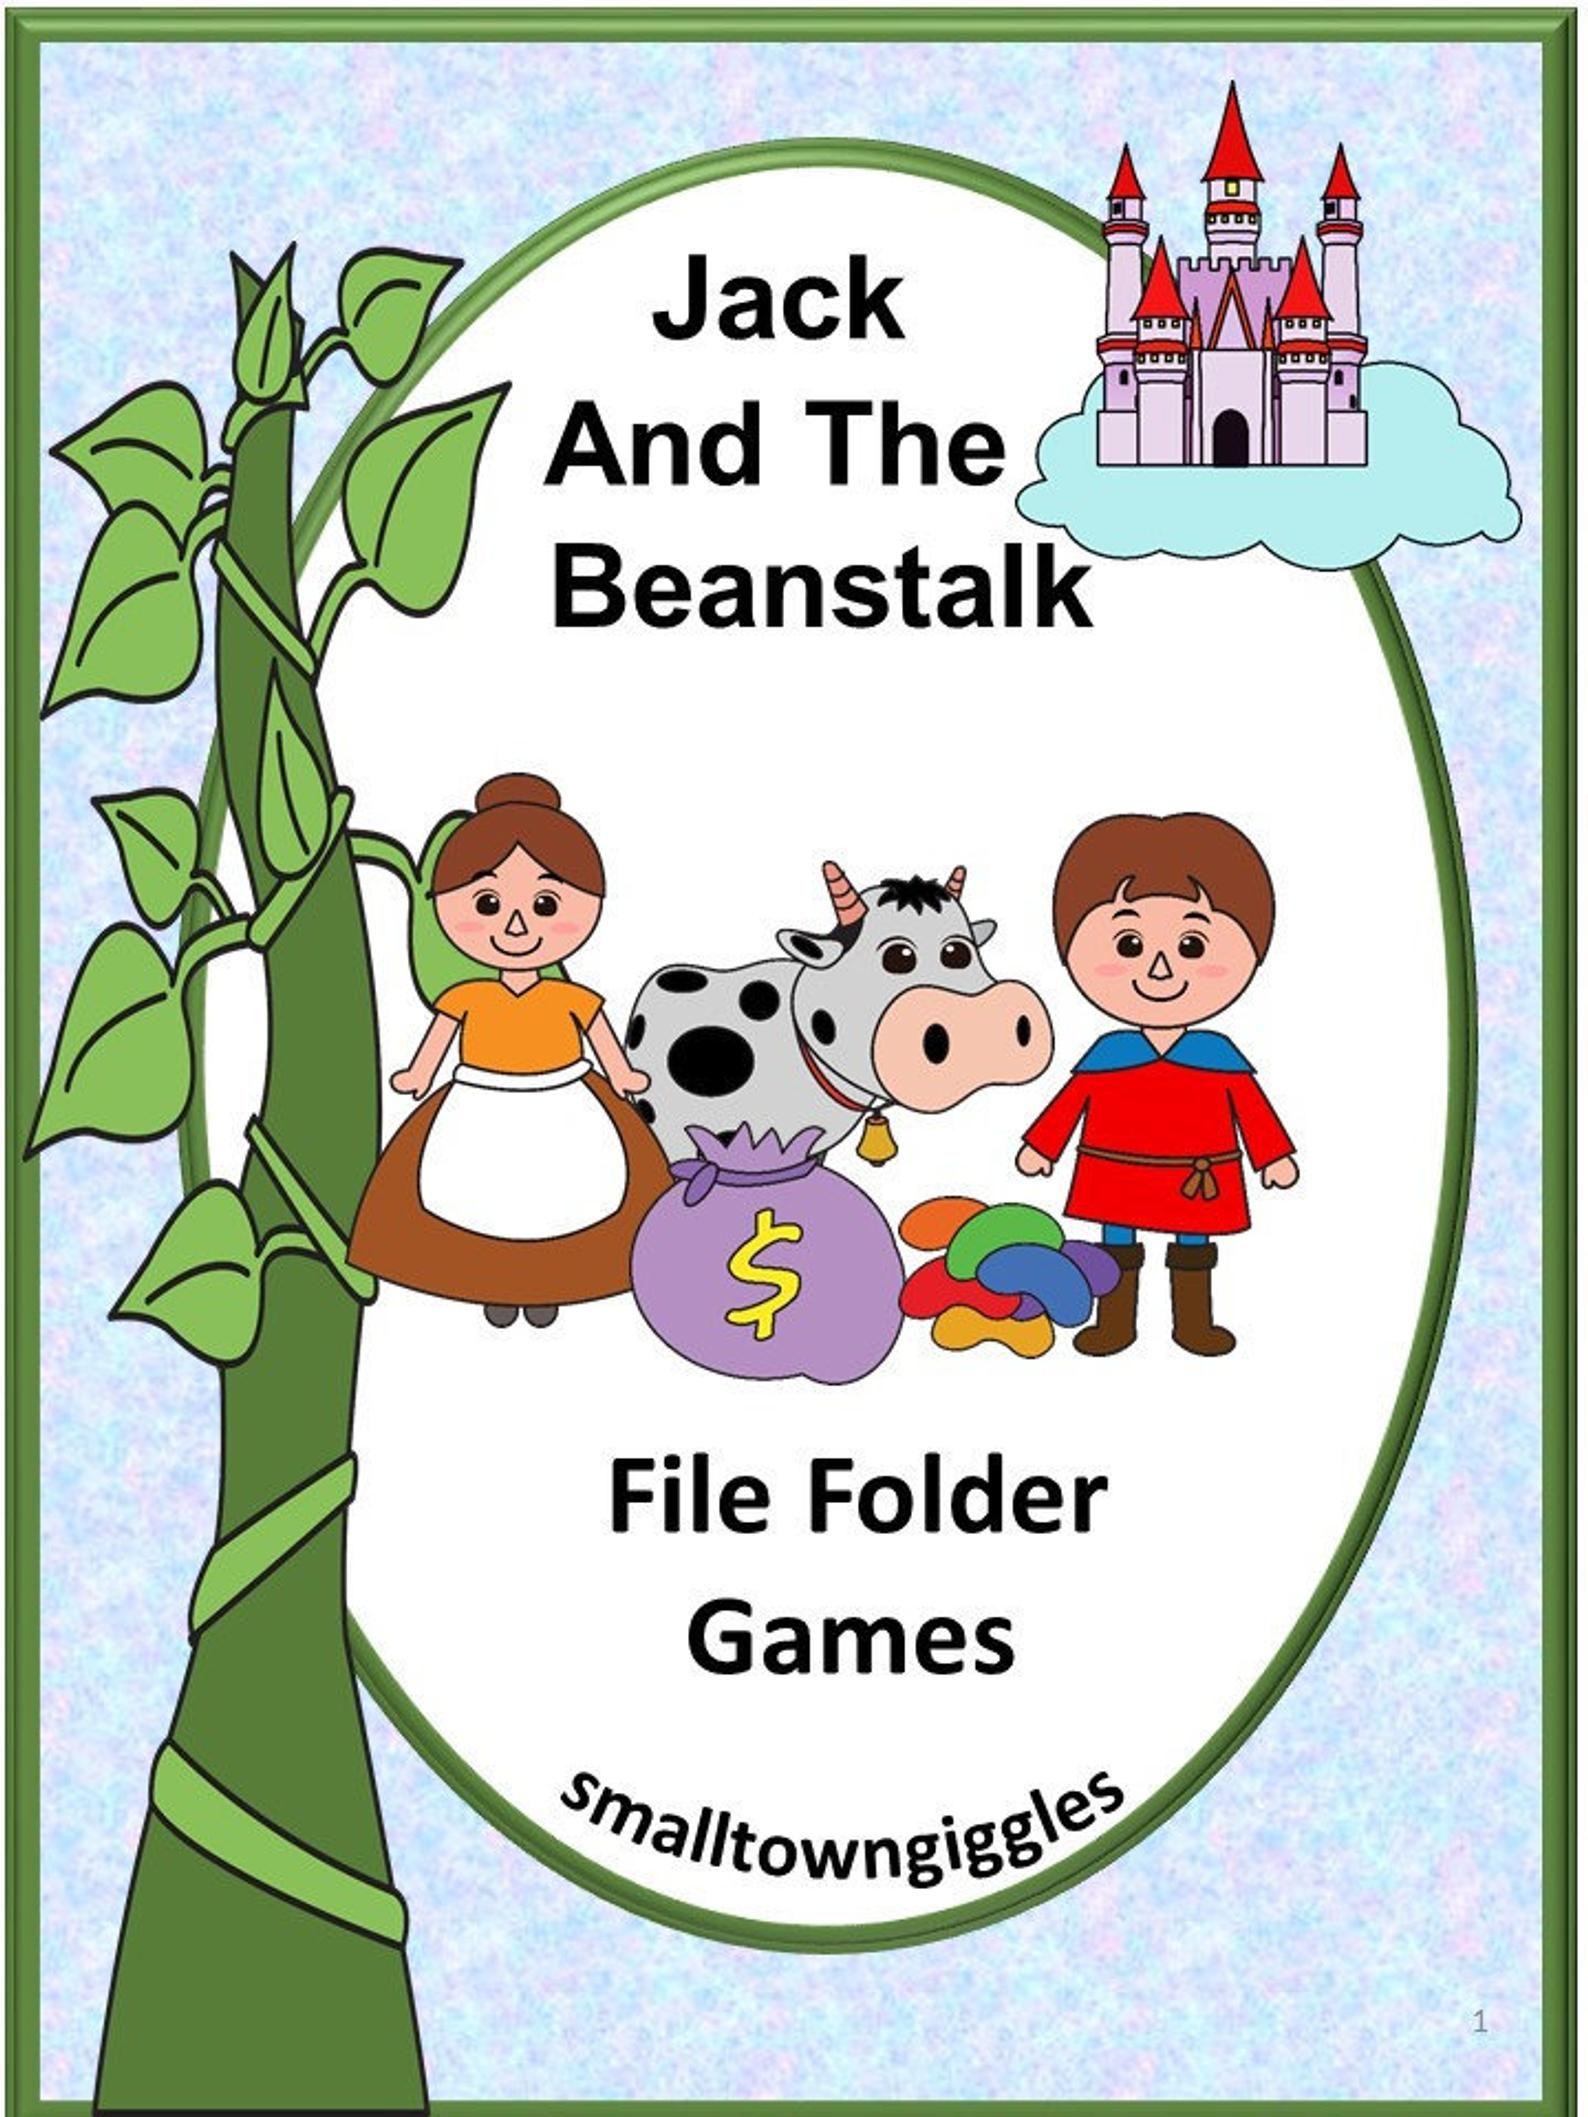 Jack And The Beanstalk File Folder Games P K K Special Ed